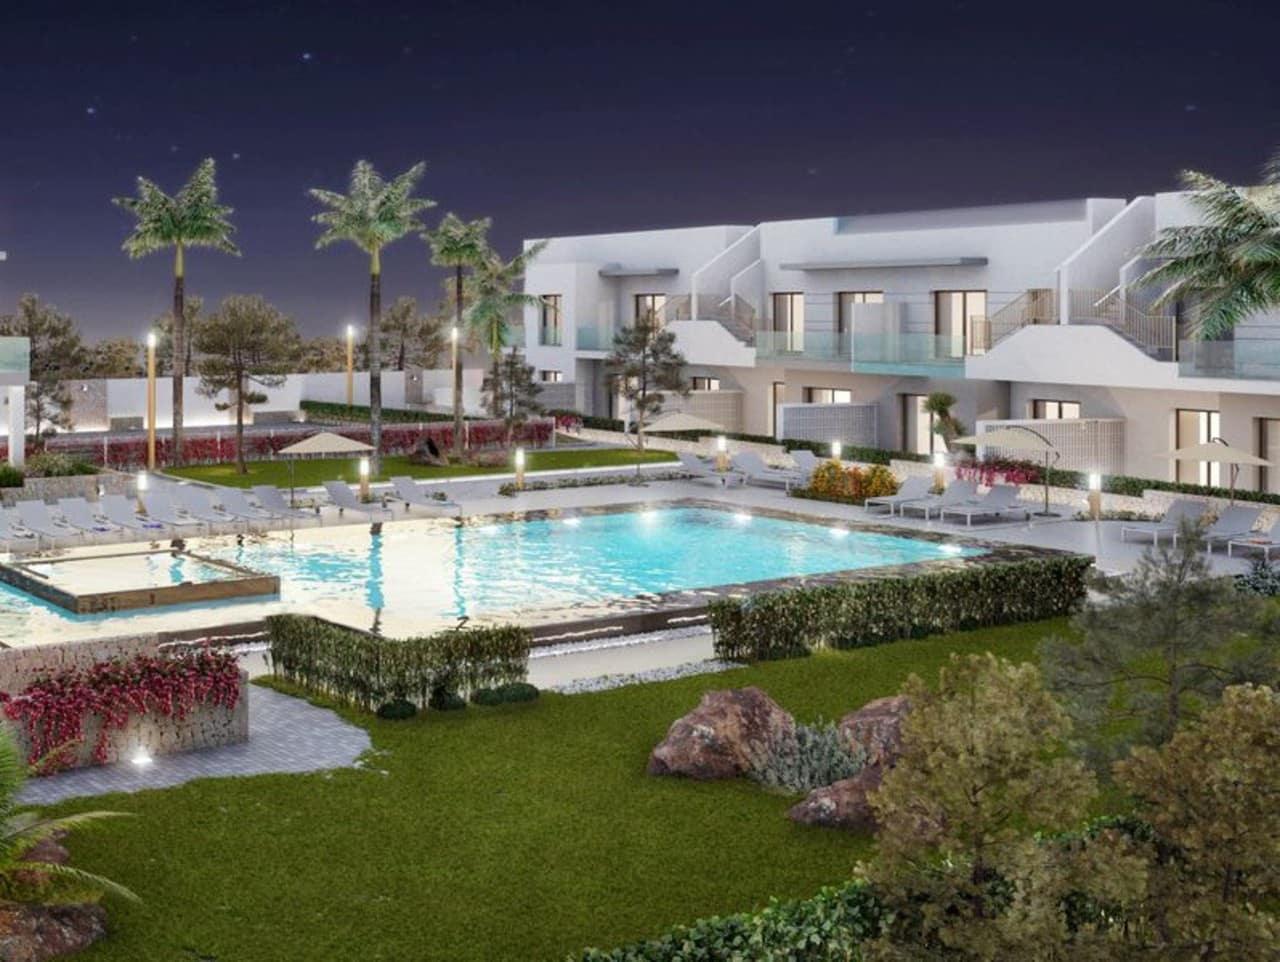 2 bedroom Apartment for sale in Pilar de la Horadada with pool - € 131,000 (Ref: 5035784)